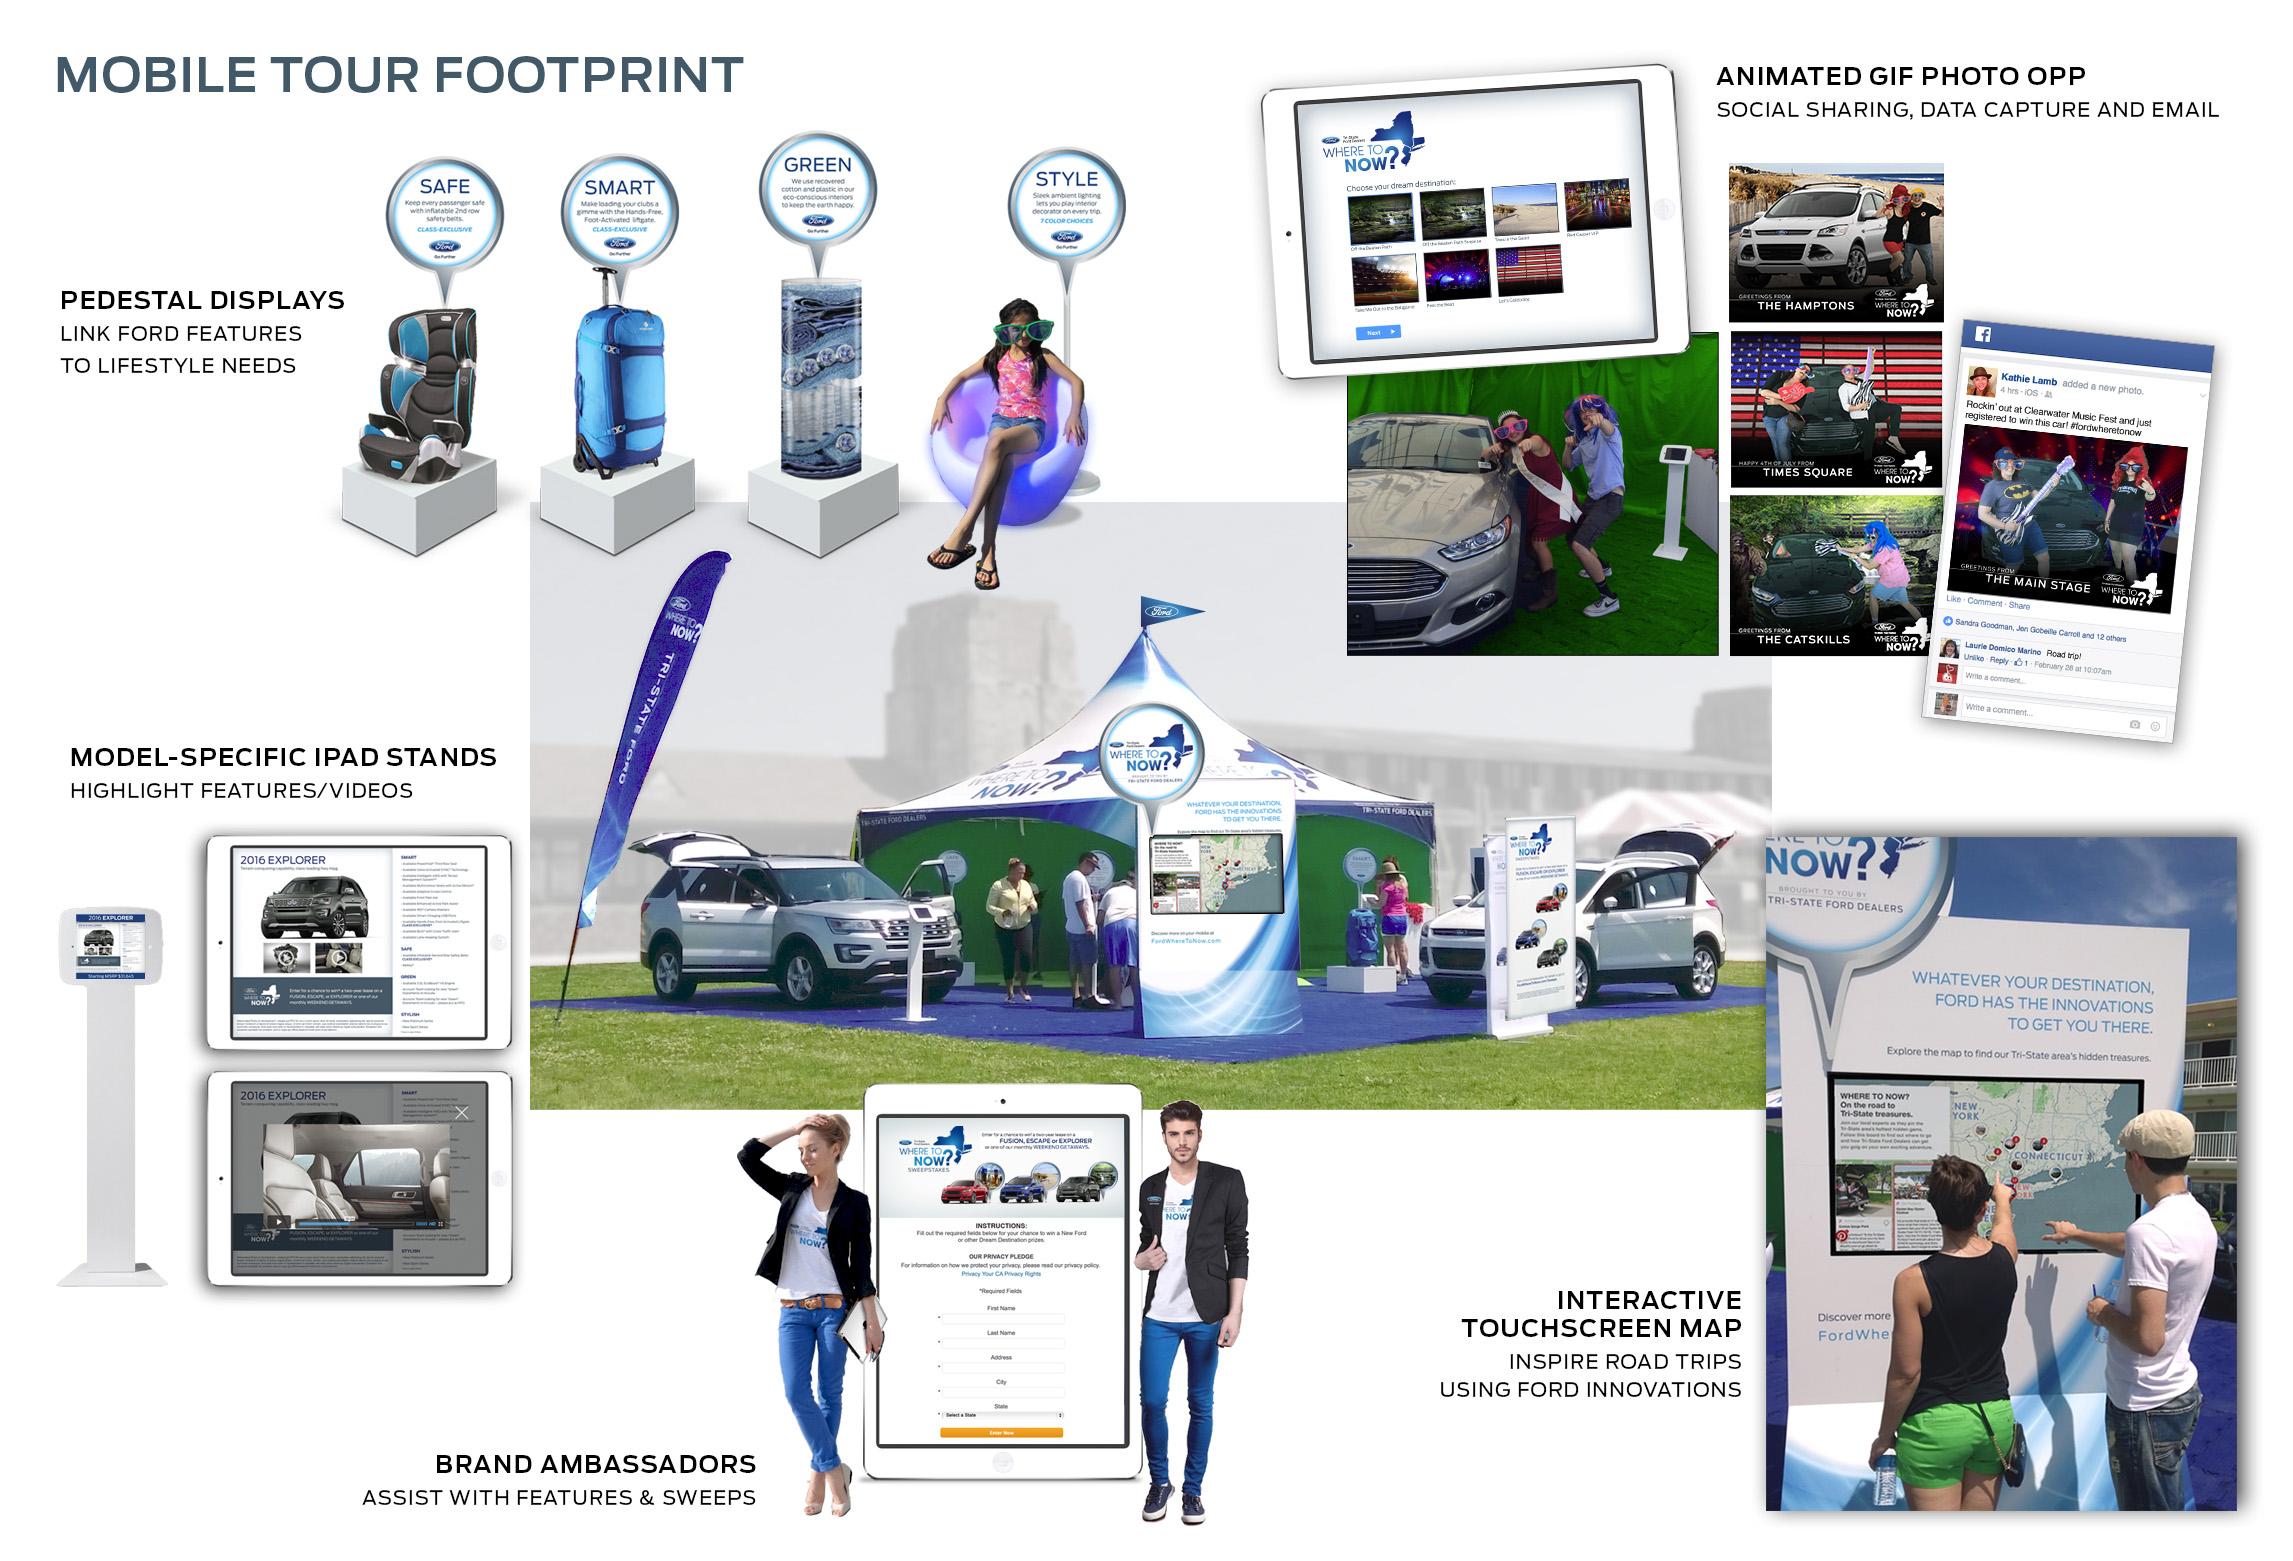 Mobile Tour Footprint